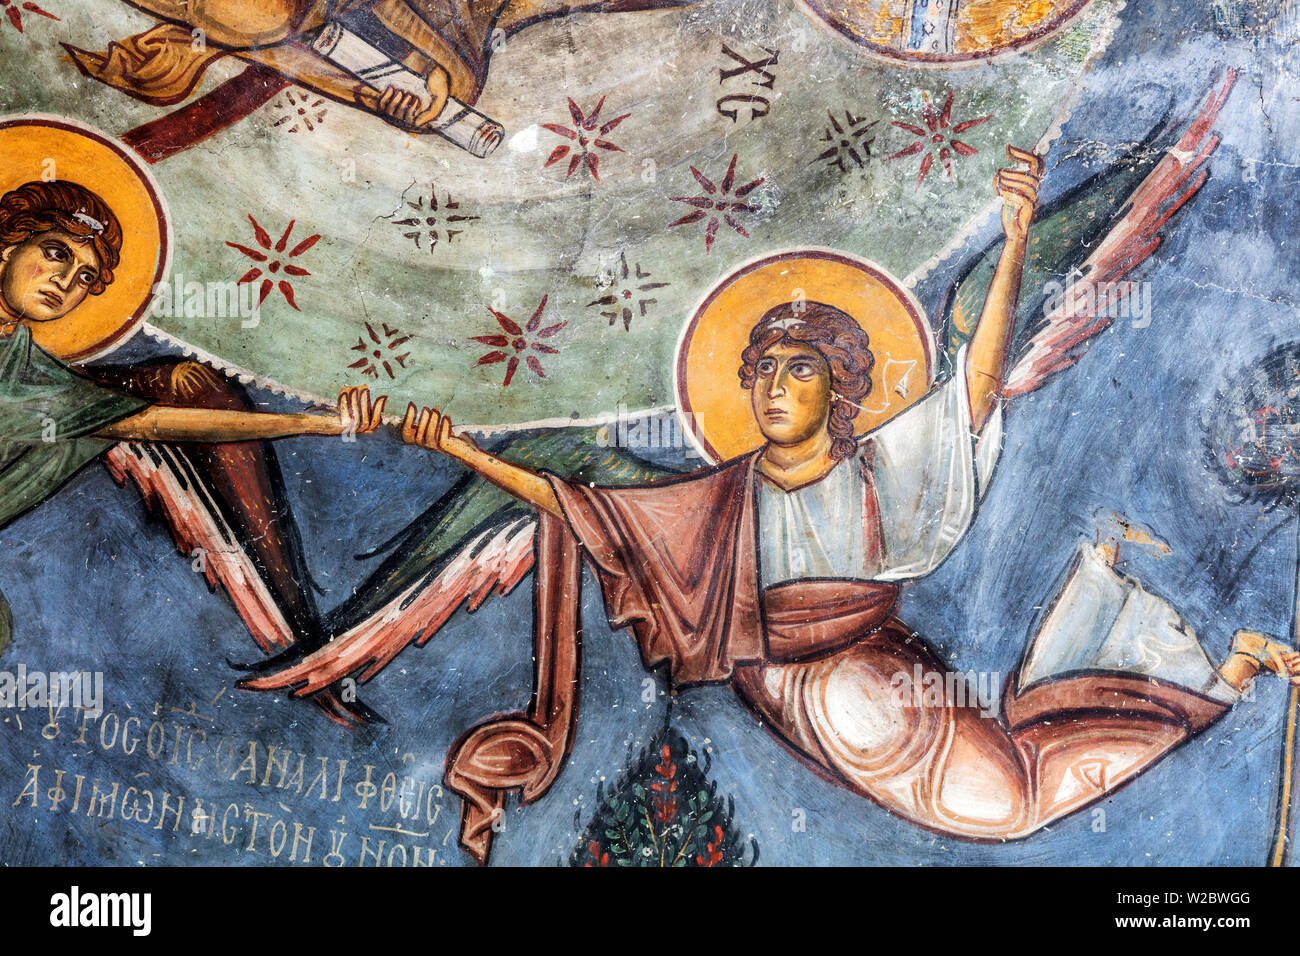 Byzantine church of Panagia Theotokos (12th century), Iskele, Northern Cyprus - Stock Image